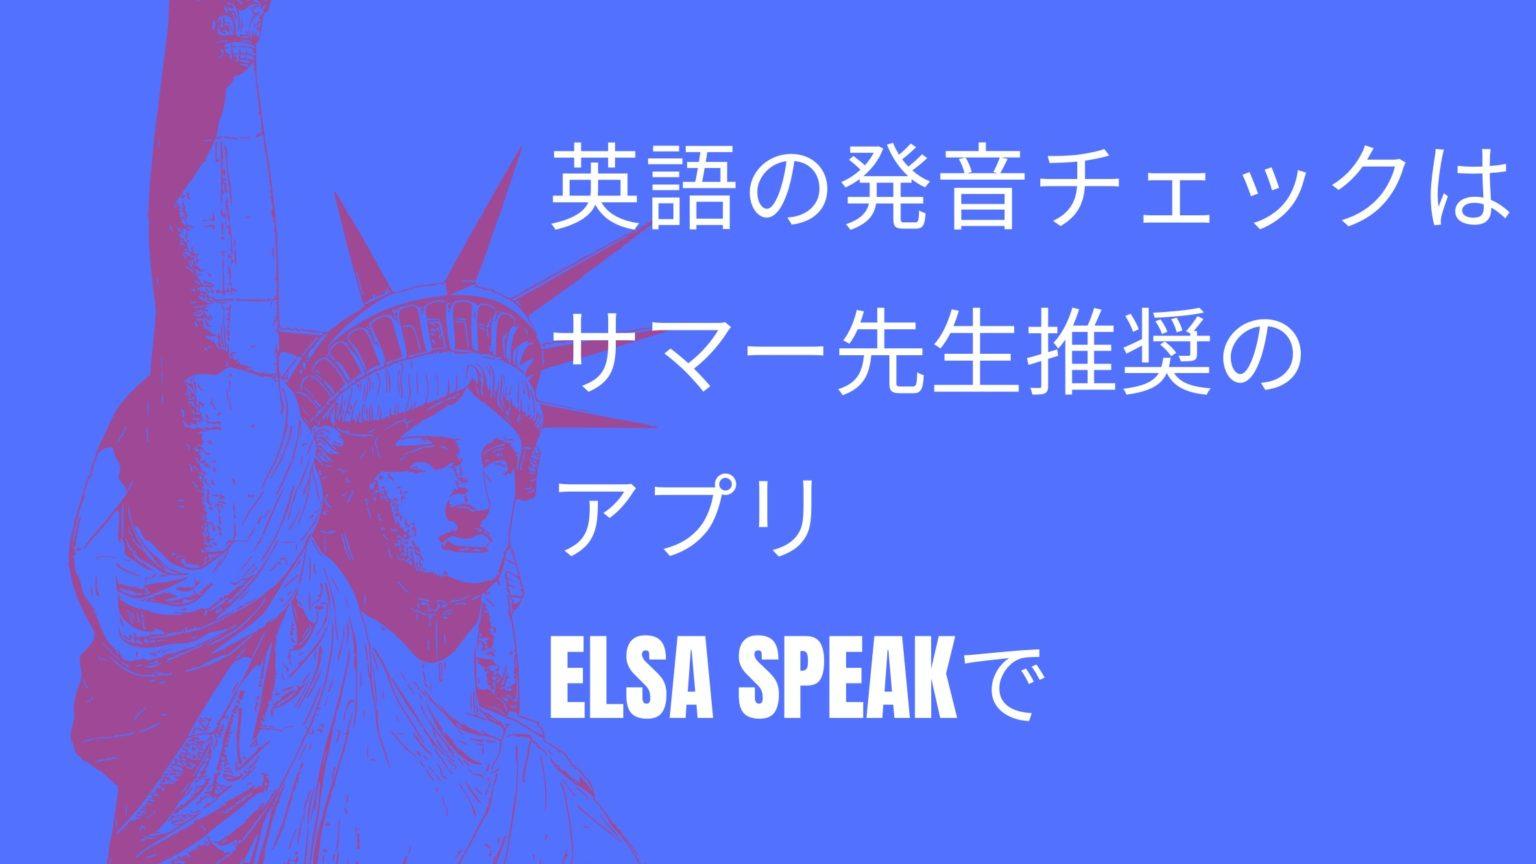 elsa speak app2